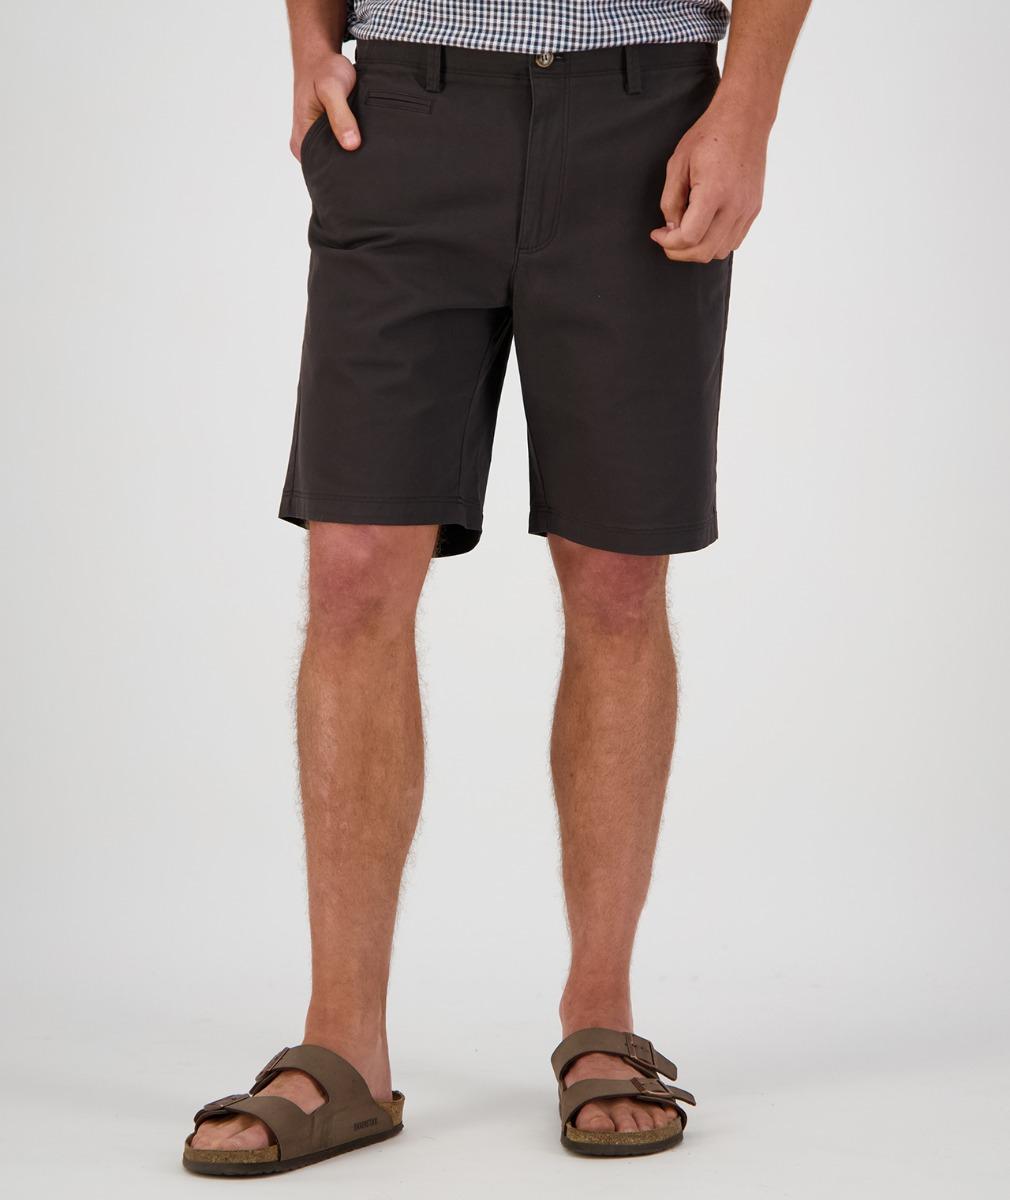 Swanndri Men's Mission Bay Chino Shorts in Black